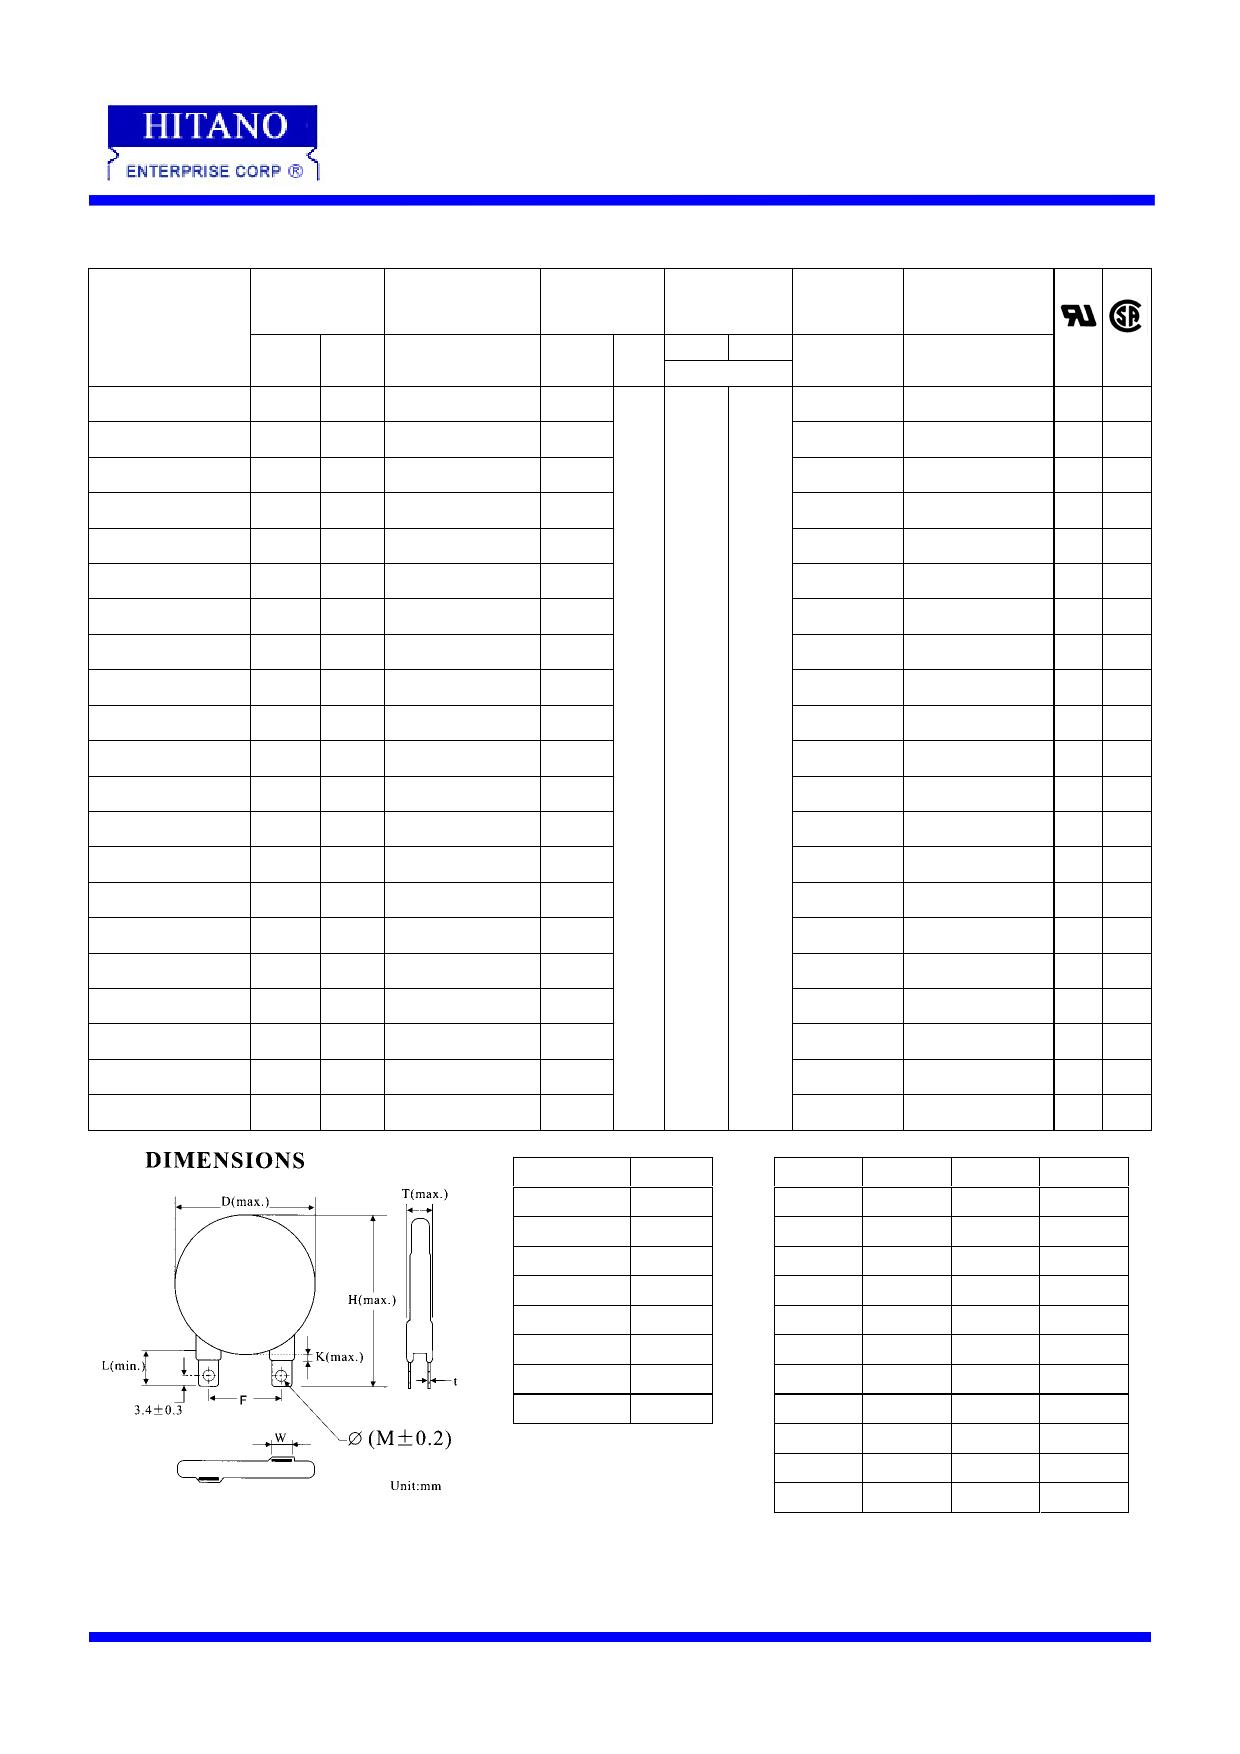 VCR-32D951K datasheet